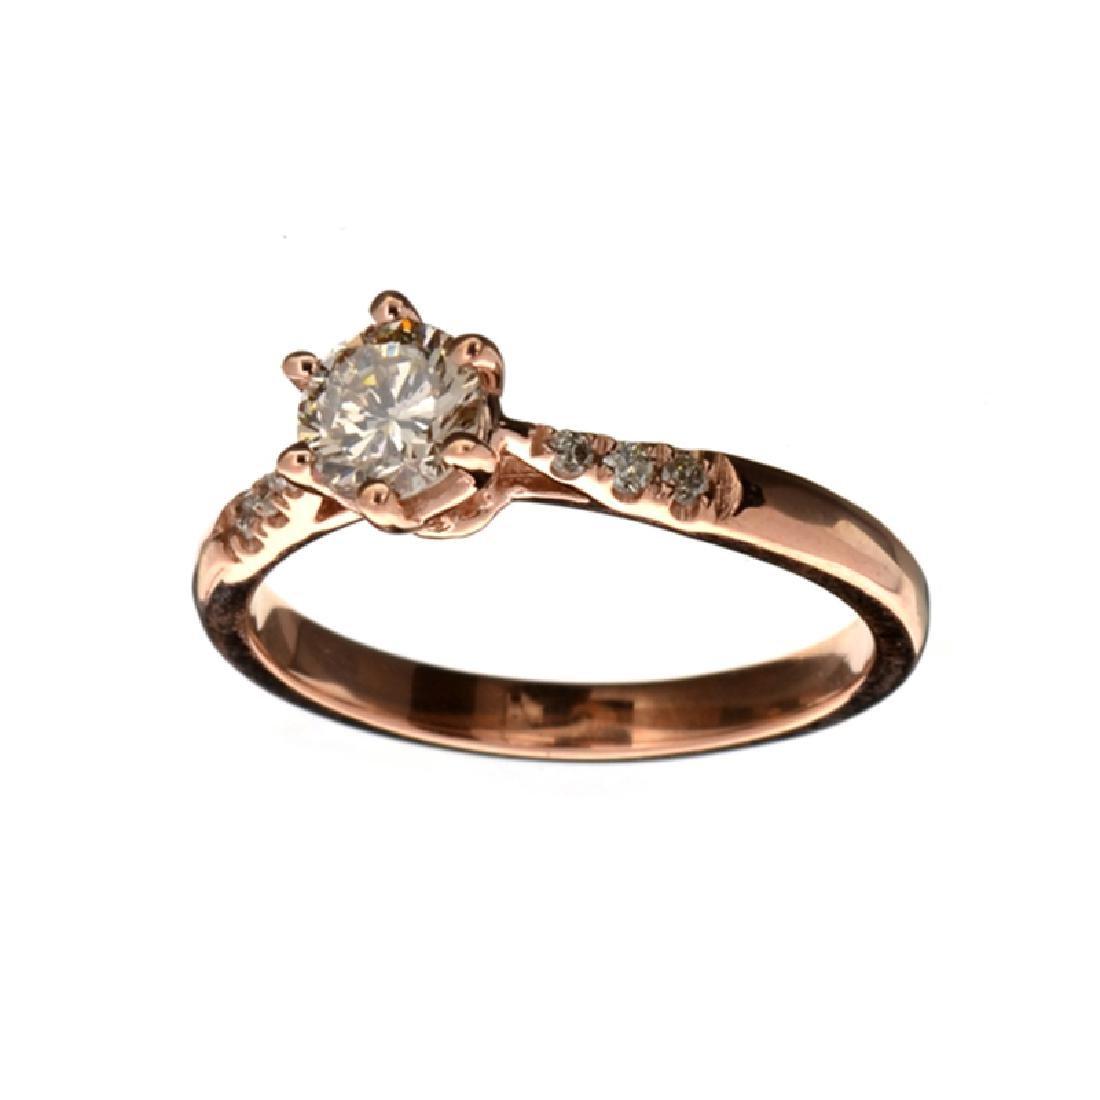 APP: 5.9k Fine Jewelry 14 kt. Rose Gold, 0.64CT Round